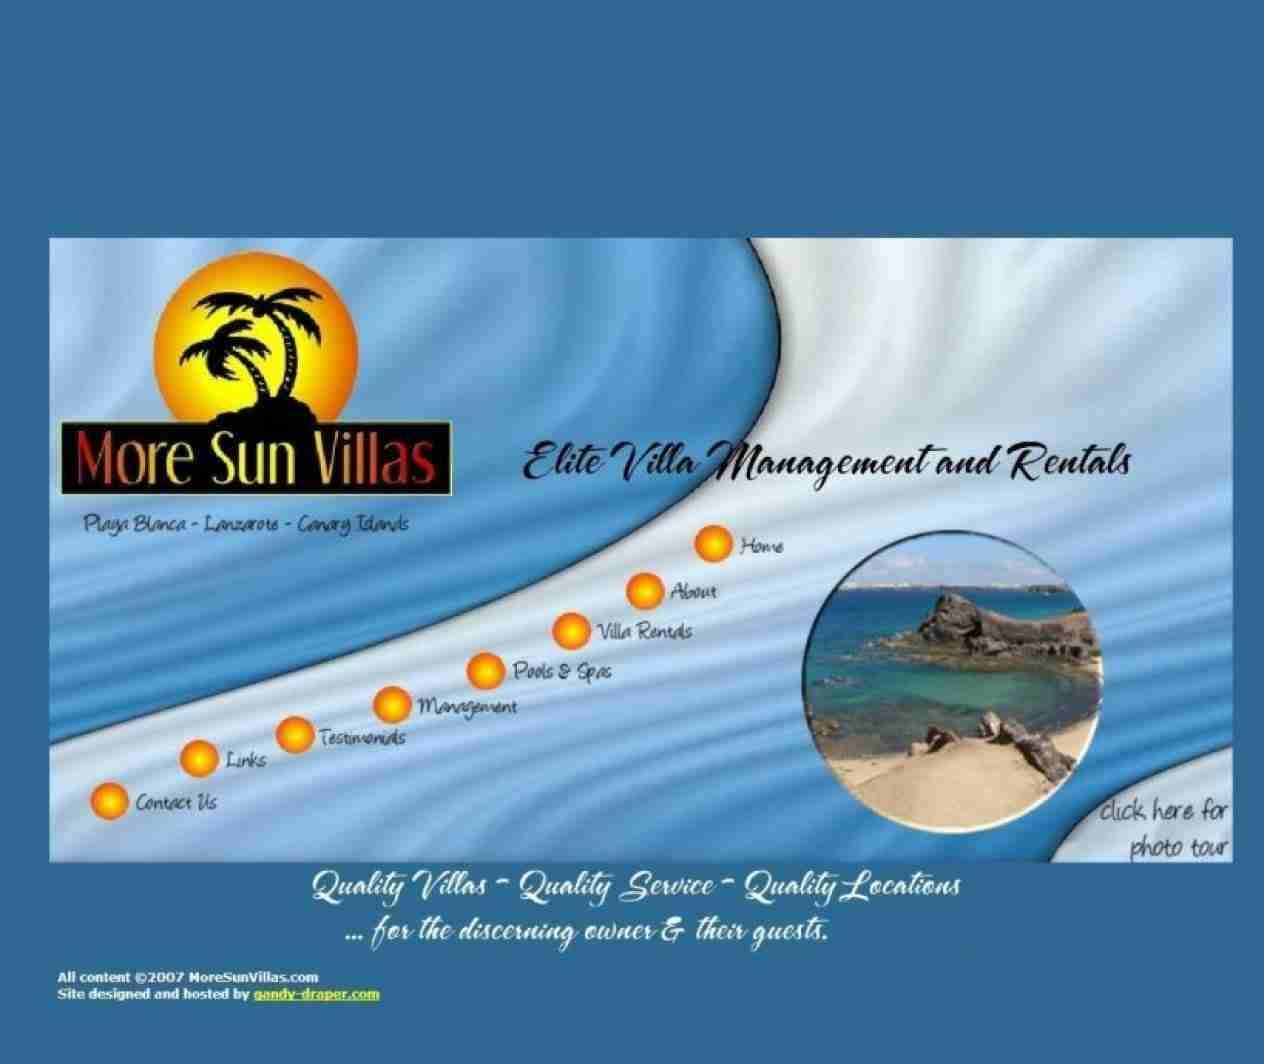 More Sun Villas